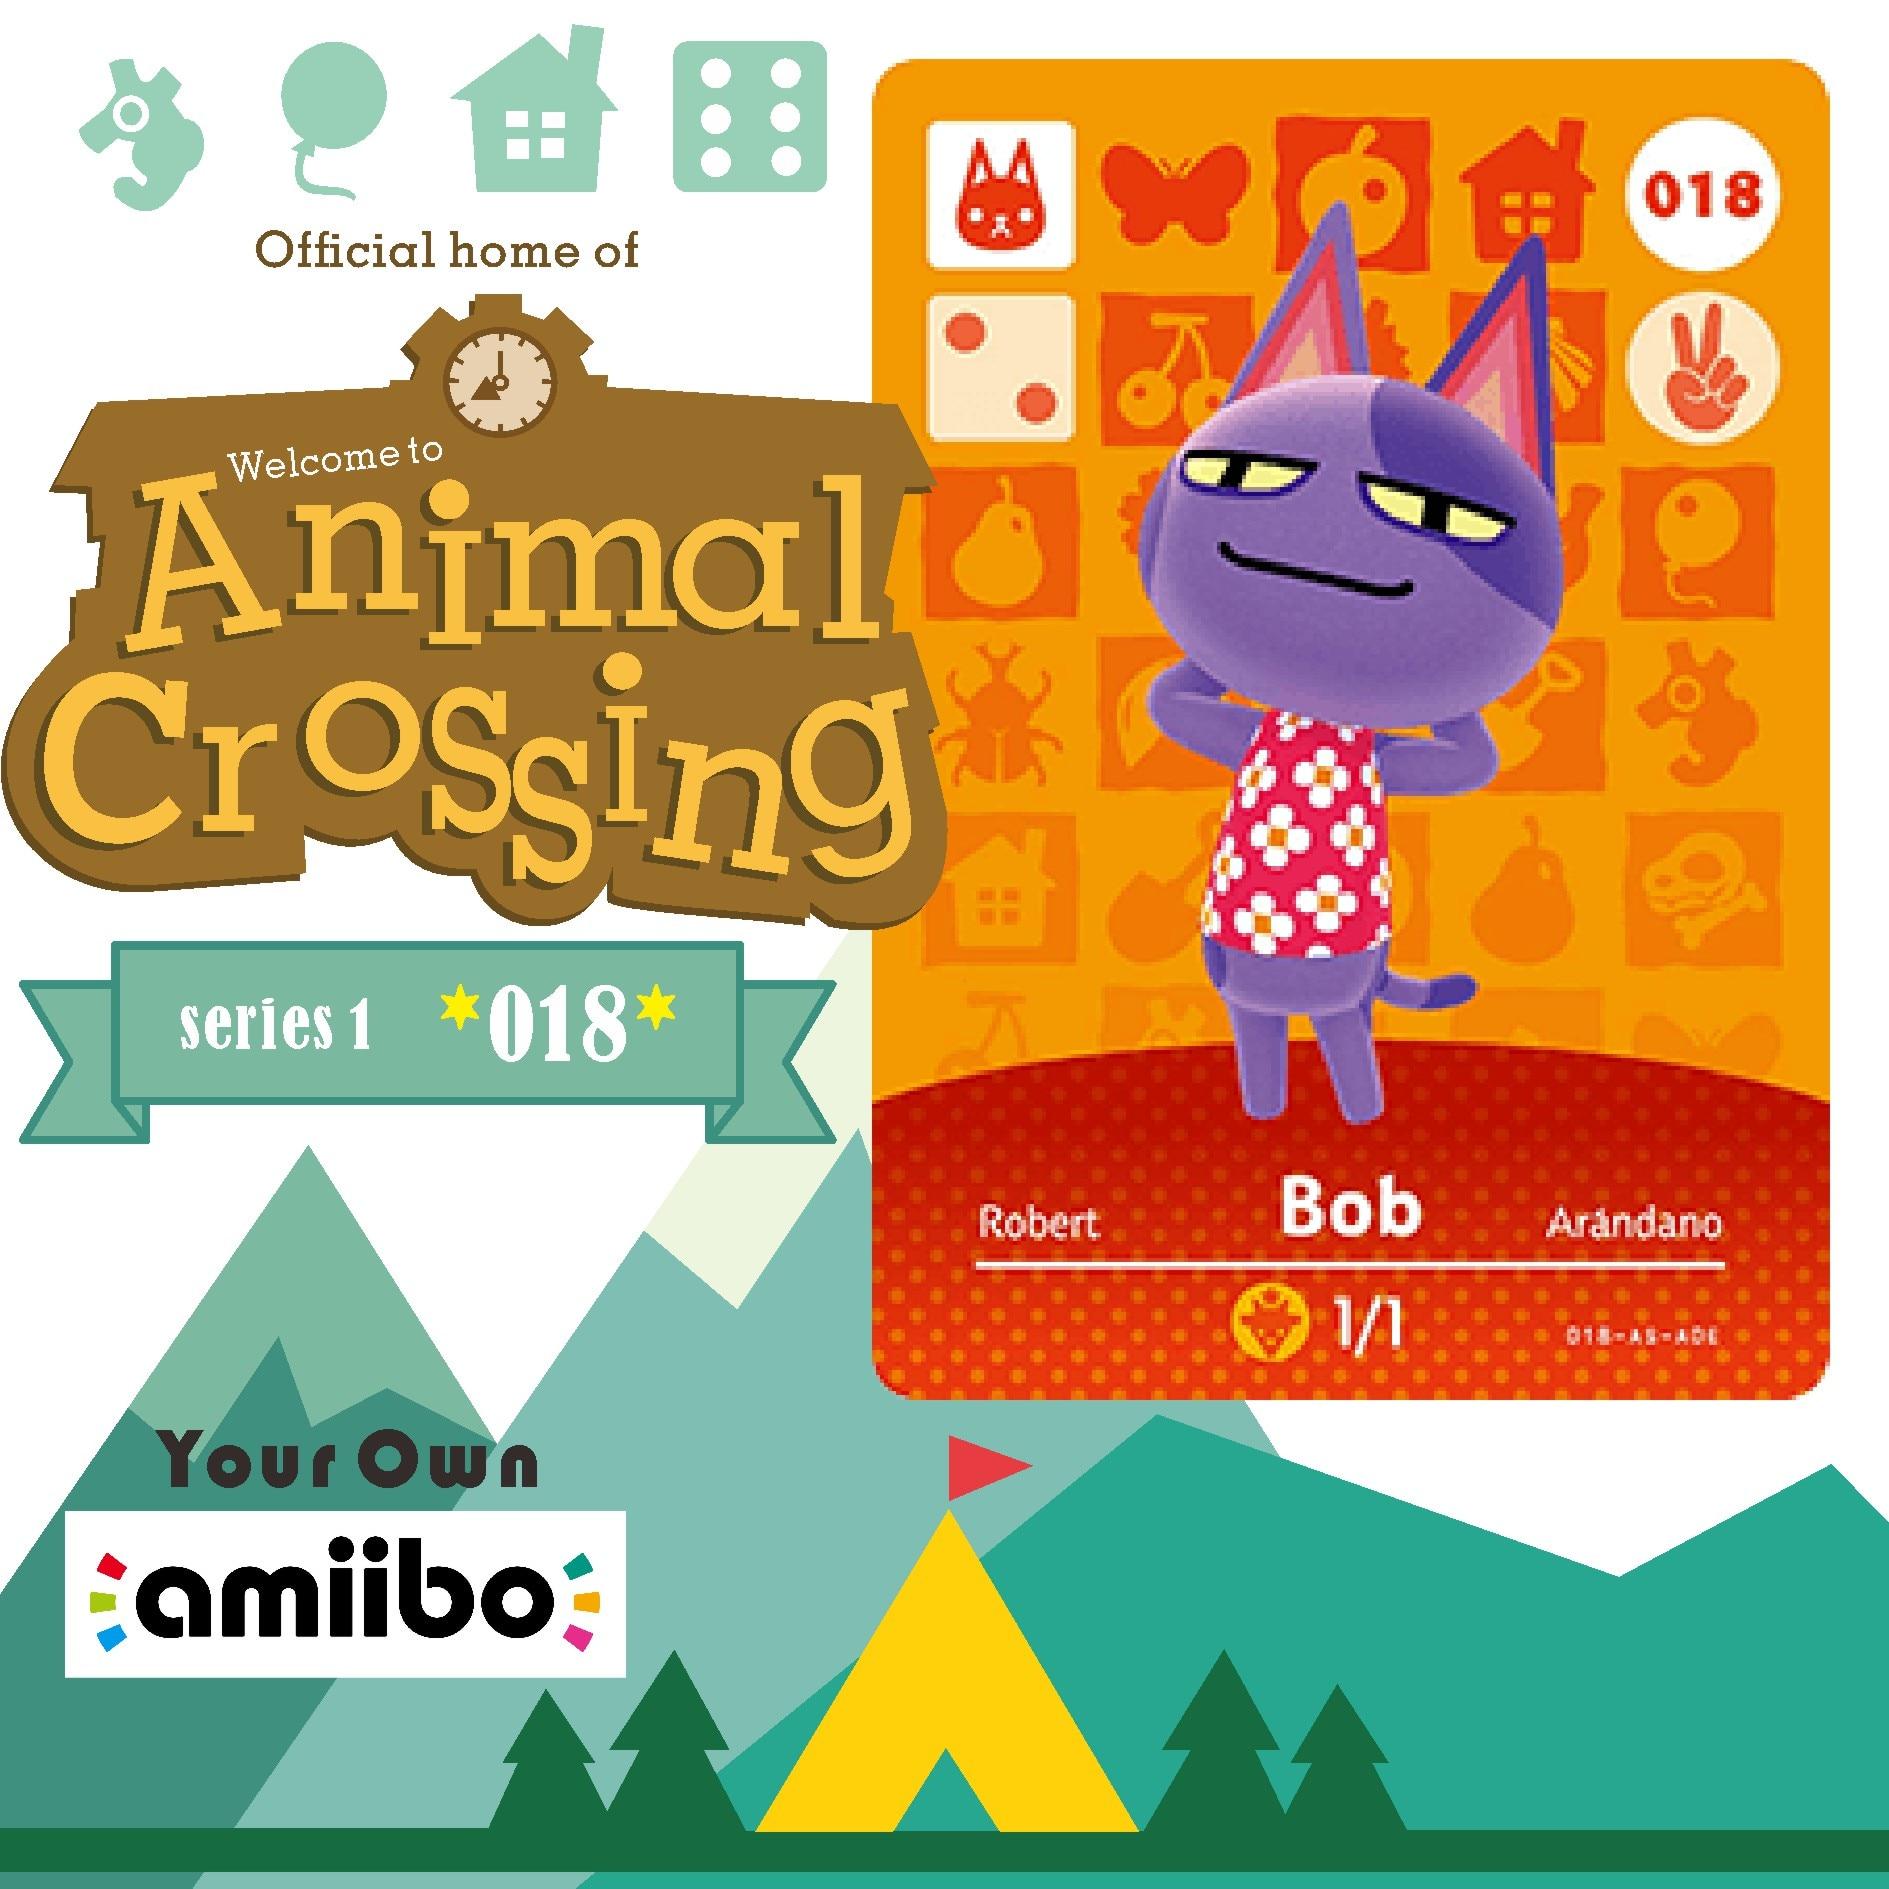 018 Bob Animal Crossing Bob Amiibo Animal Crossing Switch Rv Welcome Amiibo Villager New Horizons Amiibo Card Gift Cross Card 1